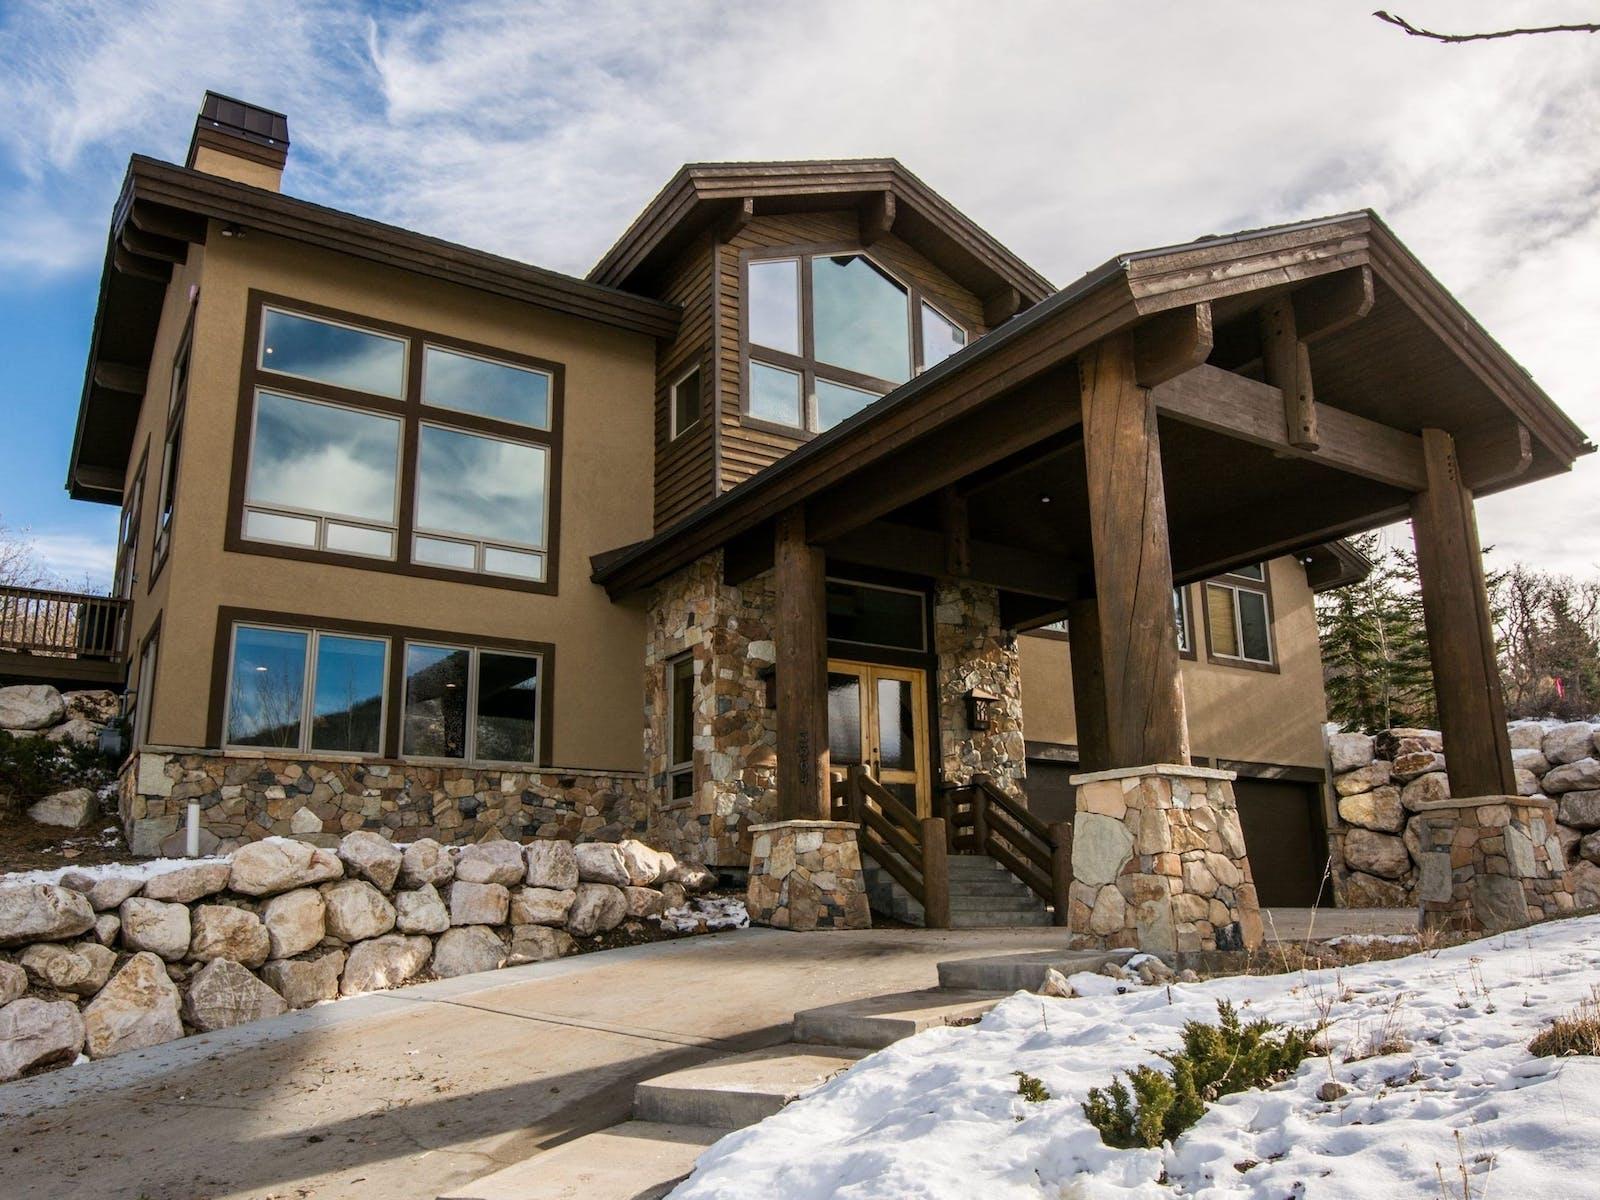 A luxury cabin in Park City, Utah